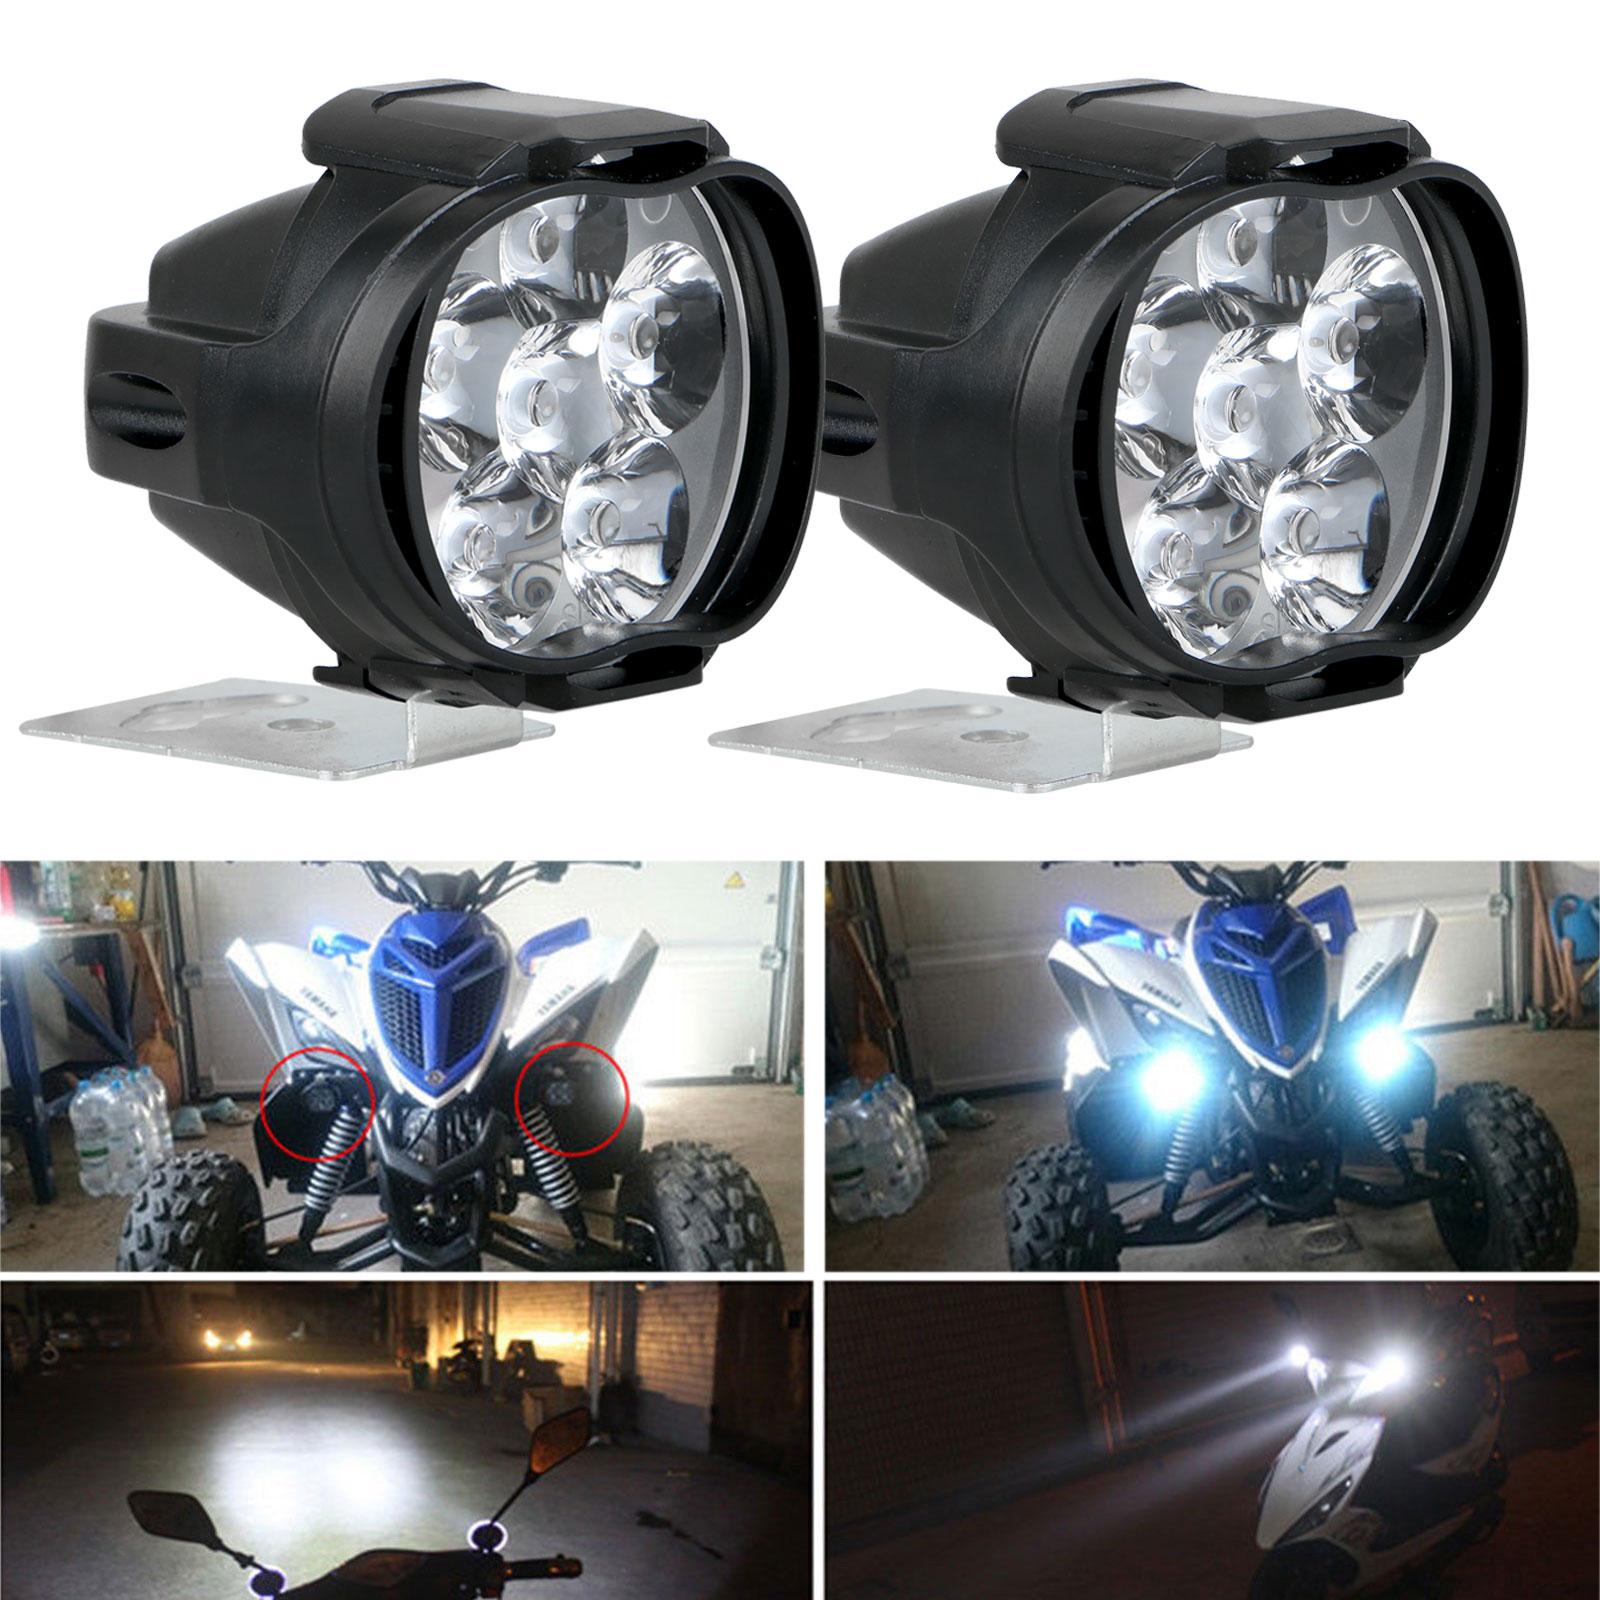 2Pcs-Universal-Car-SUV-Motorcycle-LED-Waterproof-Lights-Fog-Light-Headlight-Lamp thumbnail 11